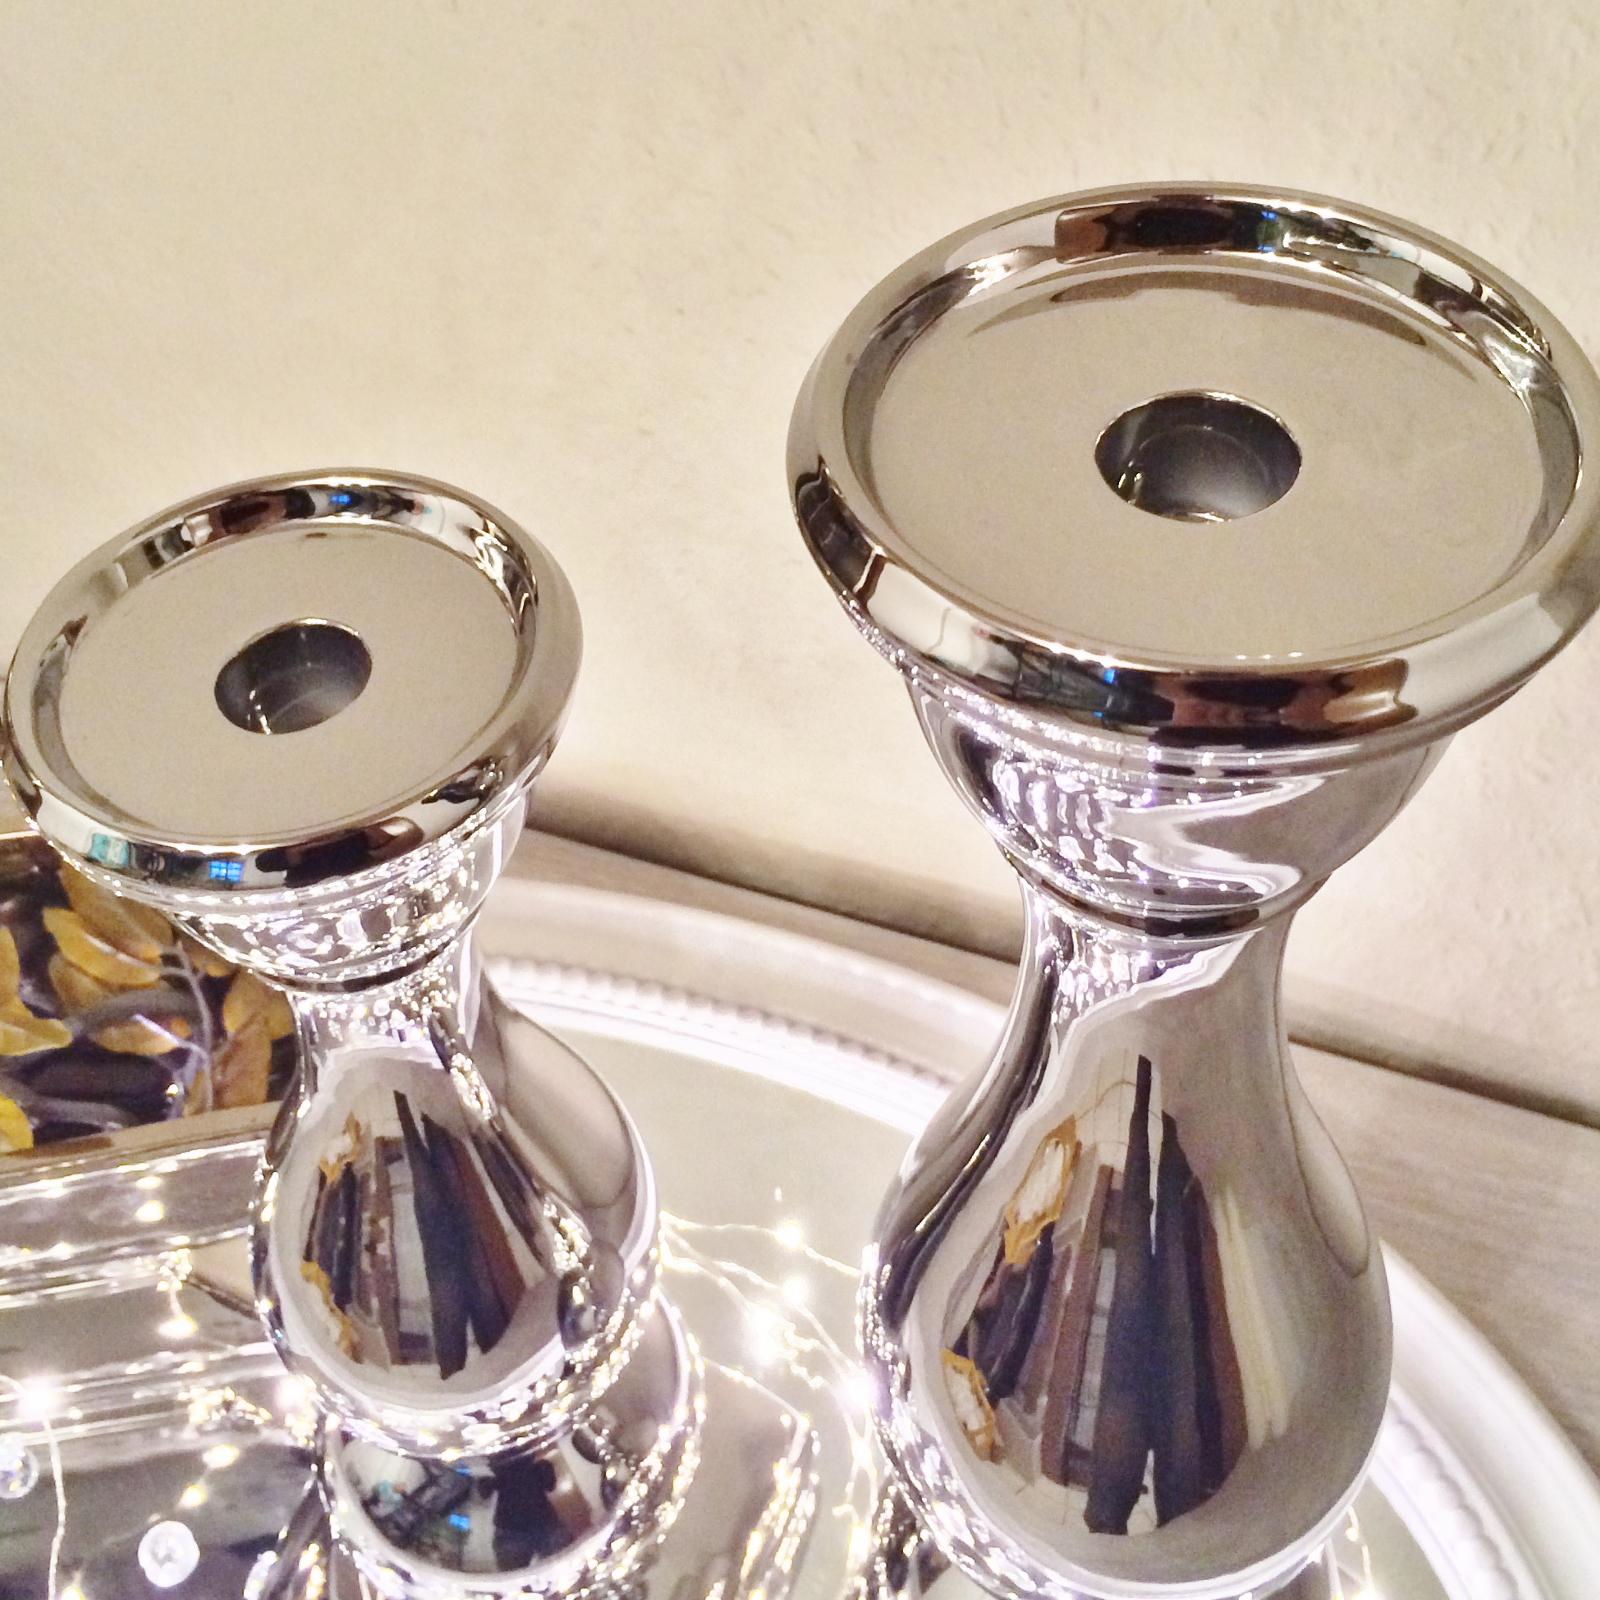 kerzenleuchter f1 kerzenst nder kerzenhalter deko keramik dekoration silber. Black Bedroom Furniture Sets. Home Design Ideas